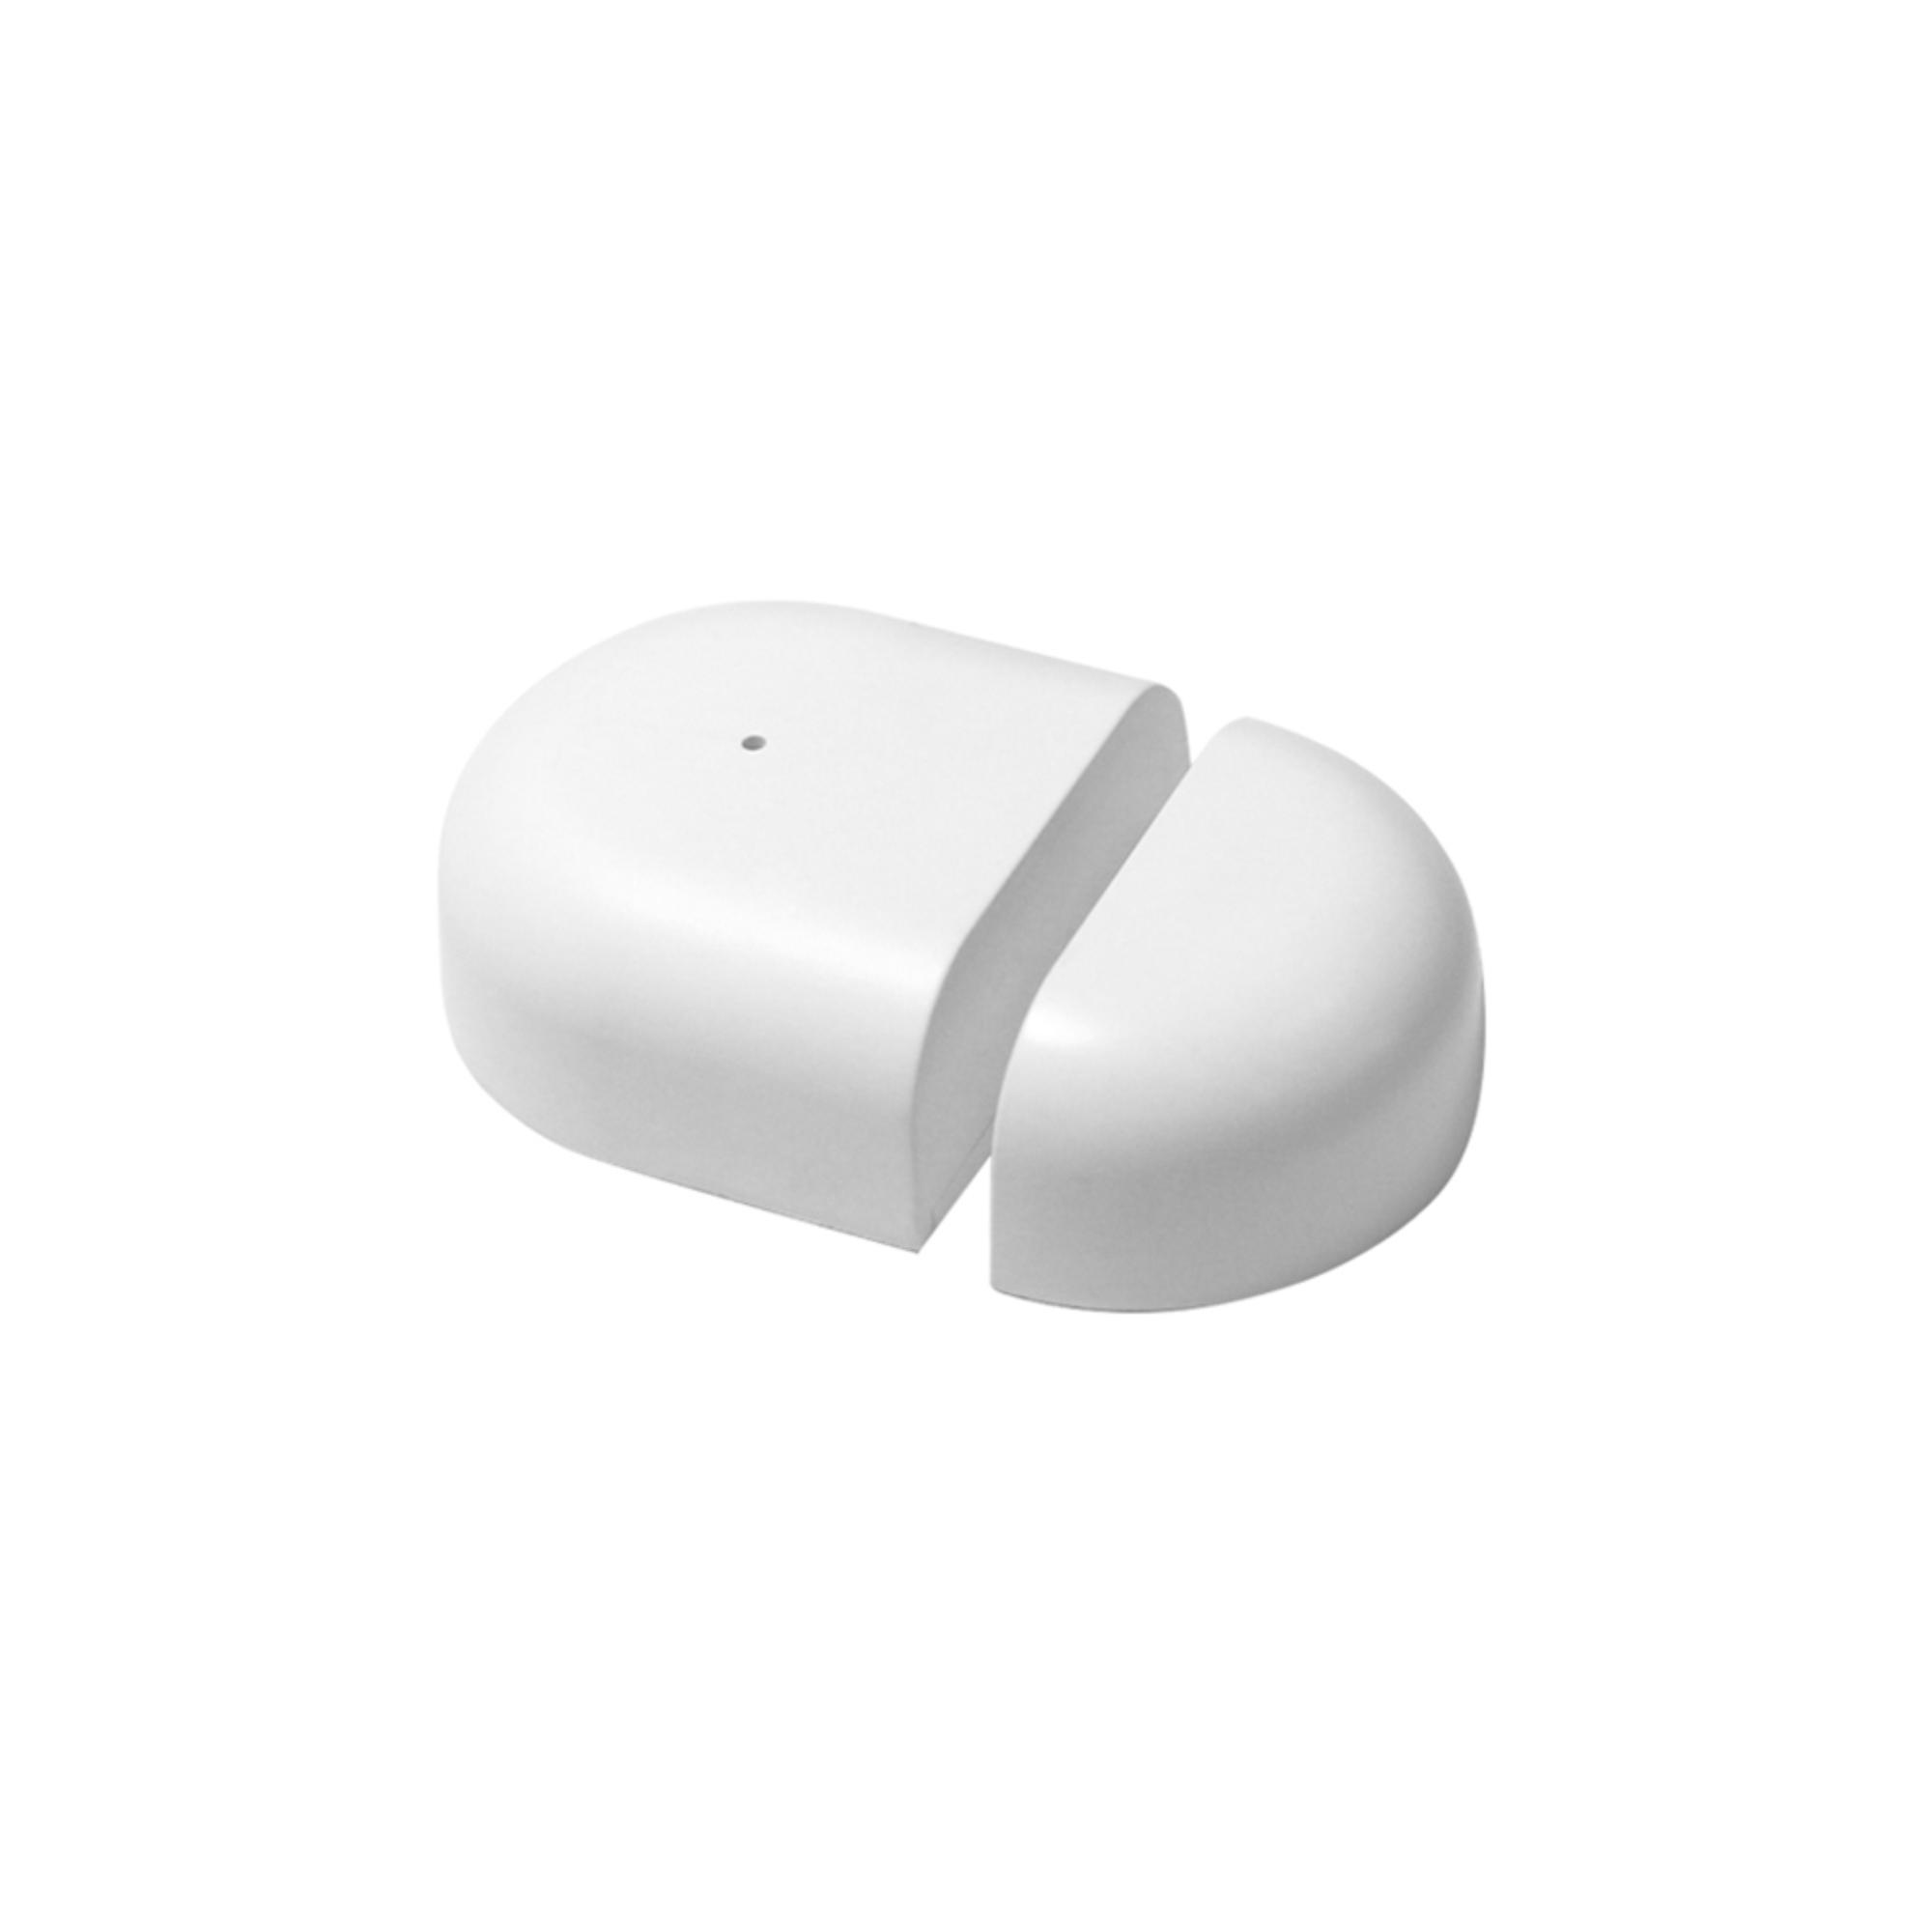 Sensref Bluetooth Tabanlı Minik Manyetik Kapı Sensörü